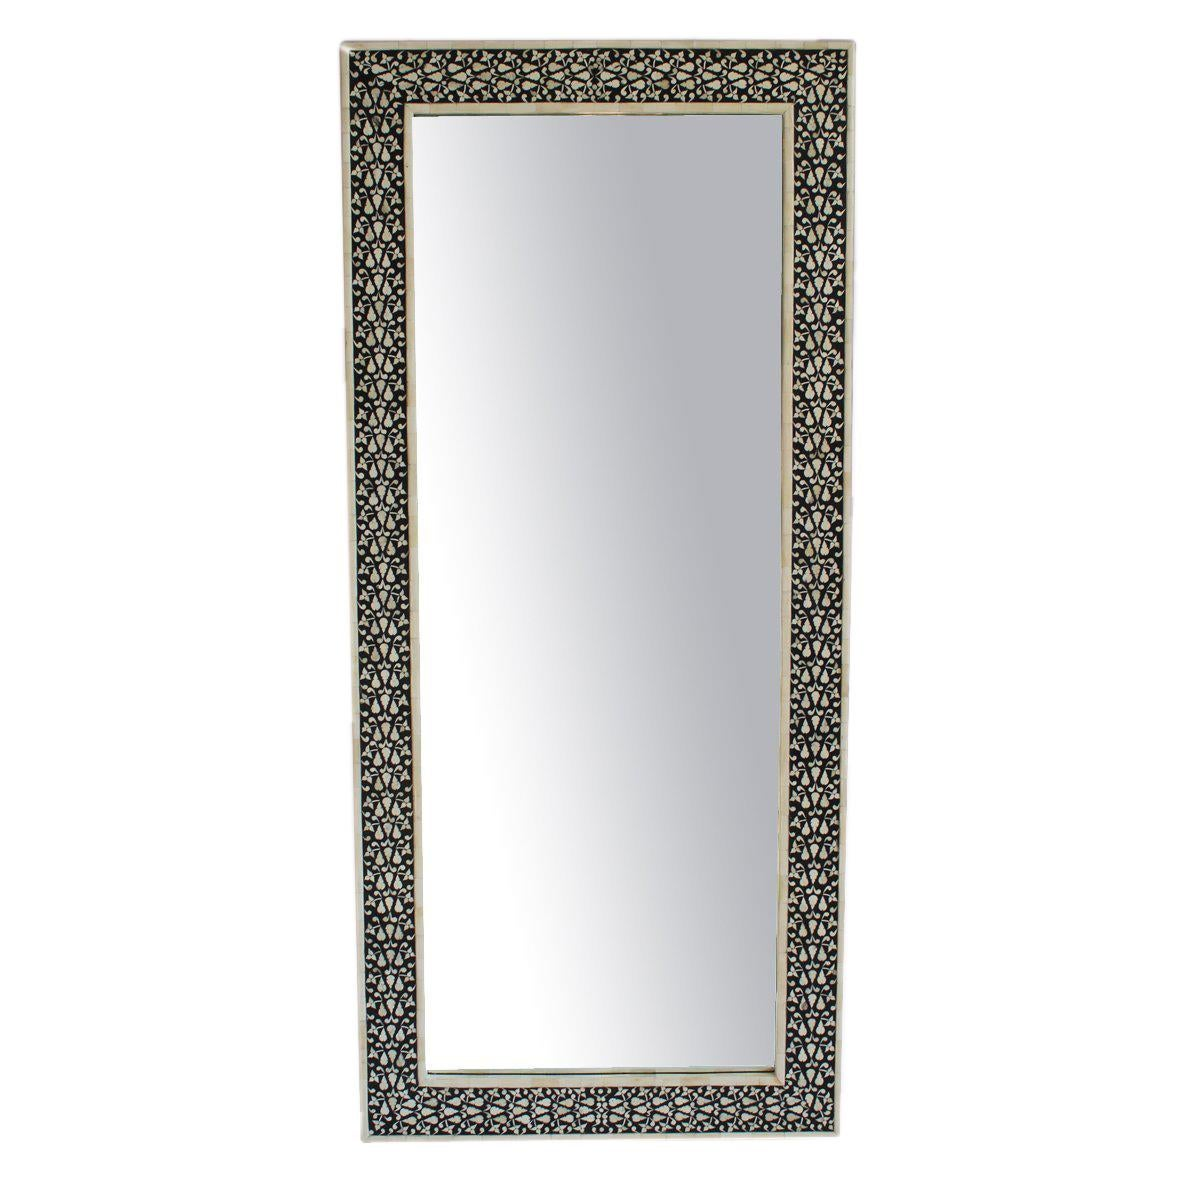 black white full length mirror chairish. Black Bedroom Furniture Sets. Home Design Ideas